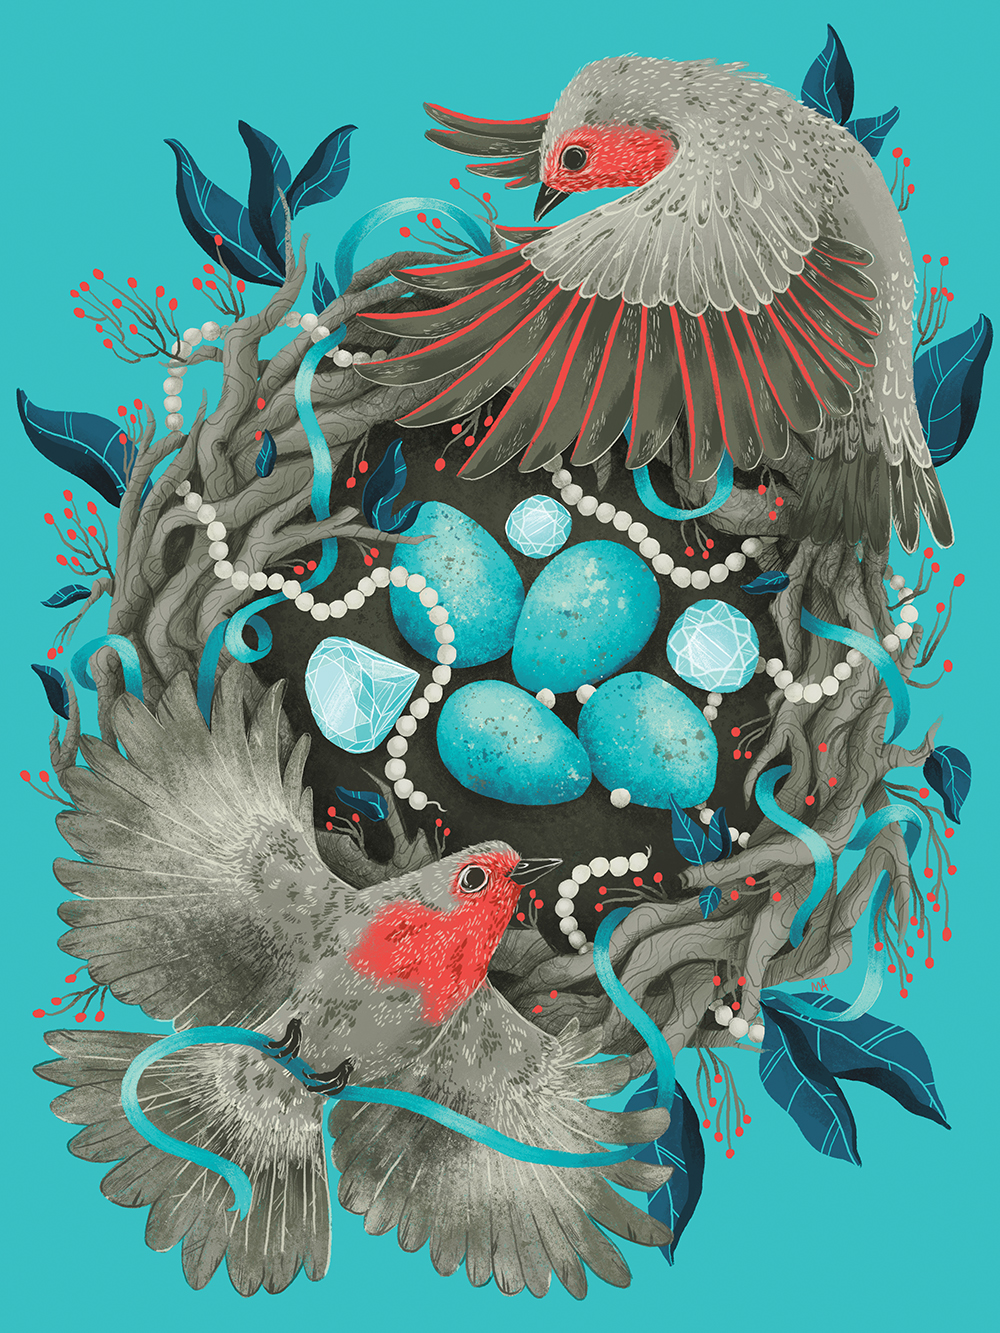 """Robin's Egg Blue"" by Monica Amneus"